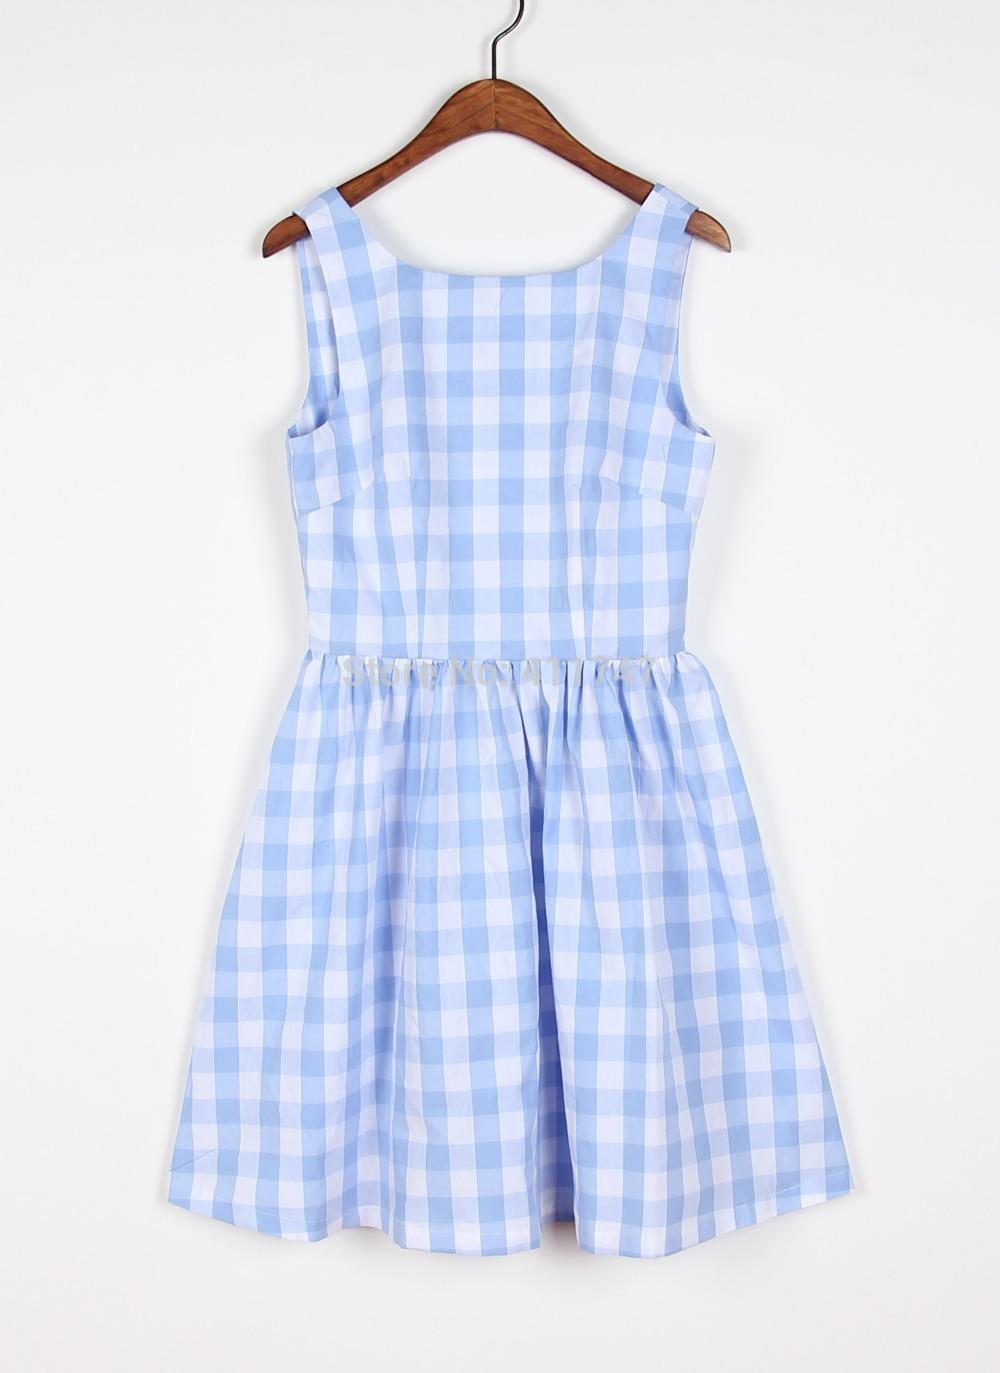 Blue Plaid Dress Dress Light Blue Plaid